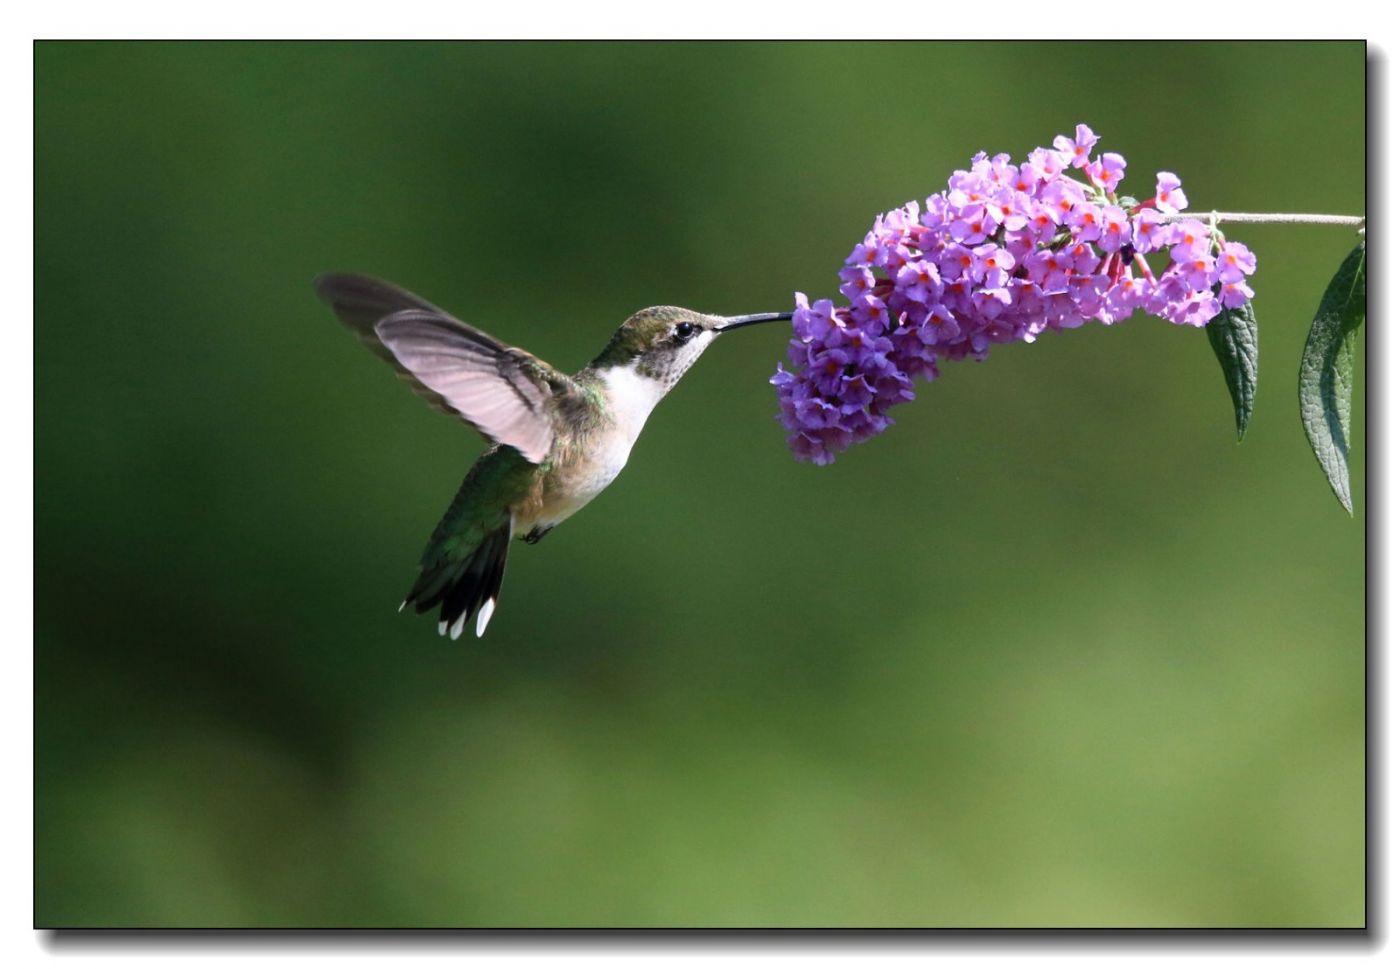 蜂鸟组图(五)_图1-7